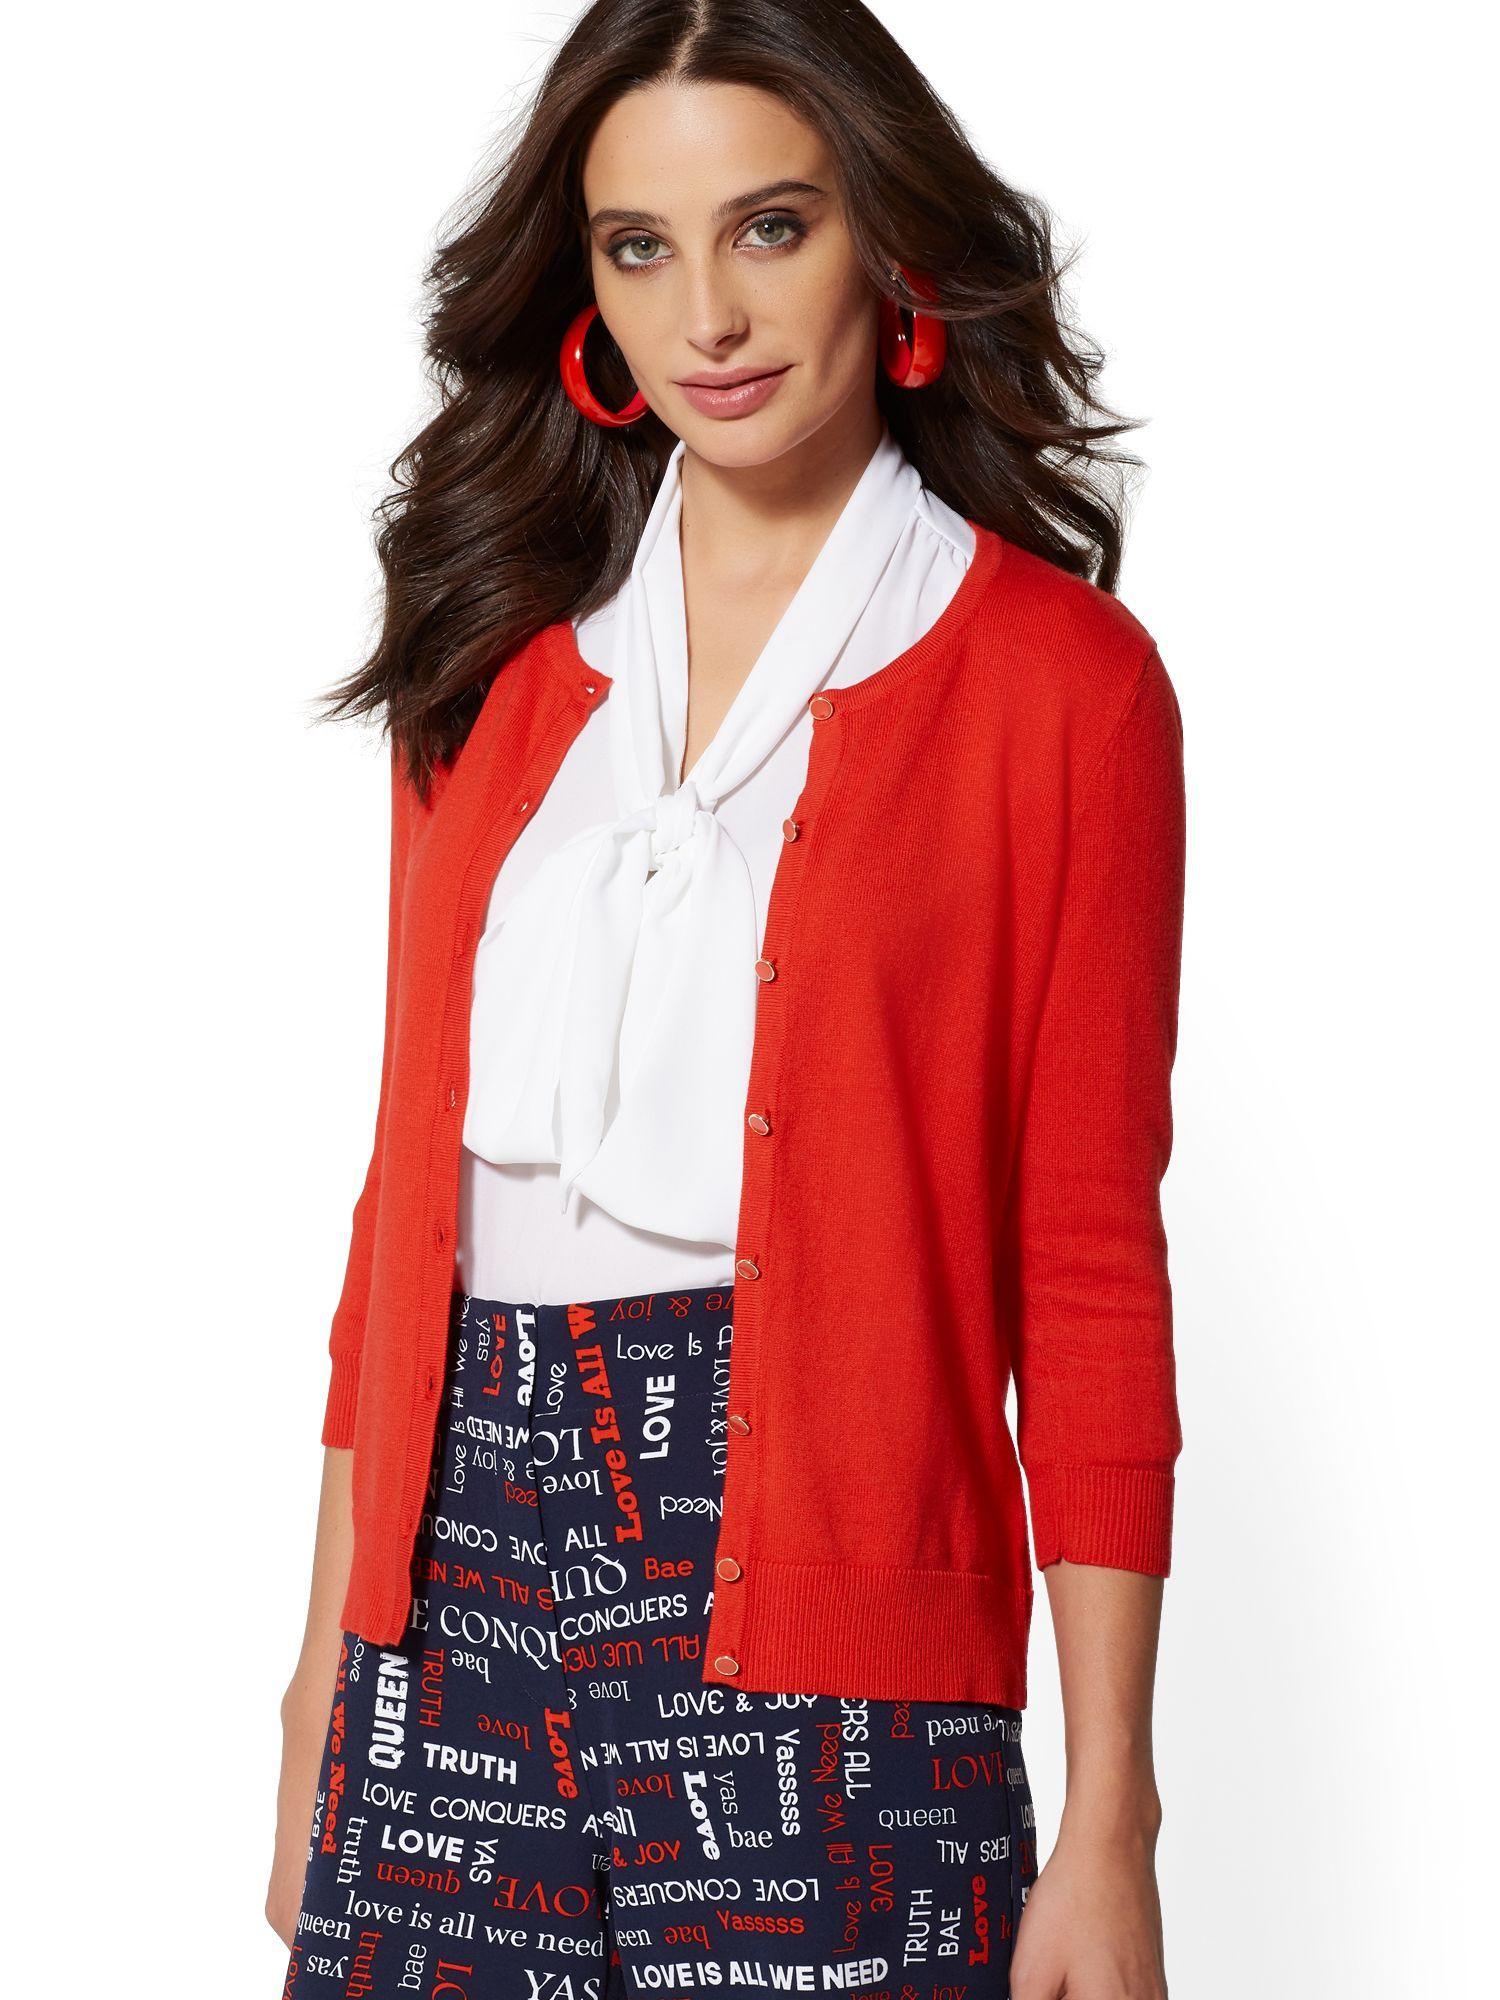 671ba17ef4c New York   Company. Women s Red 7th Avenue - Enamel-button Chelsea Crewneck  Cardigan